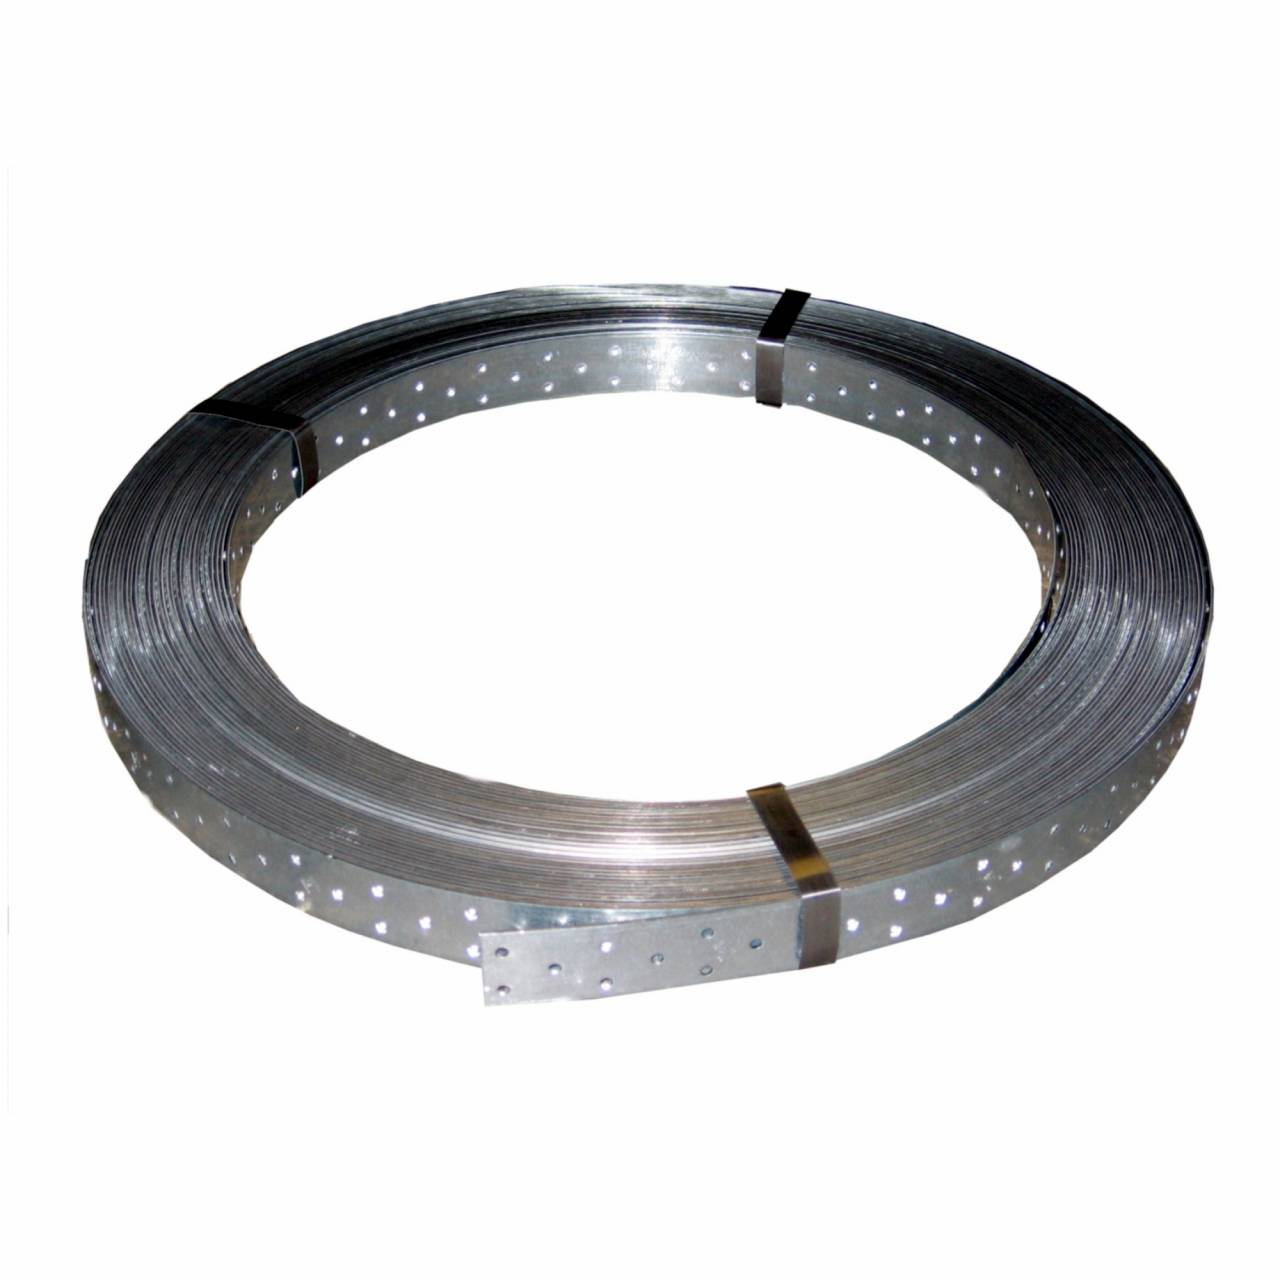 Windrispenband vz 40 x 1,5 mm x 50 lfm